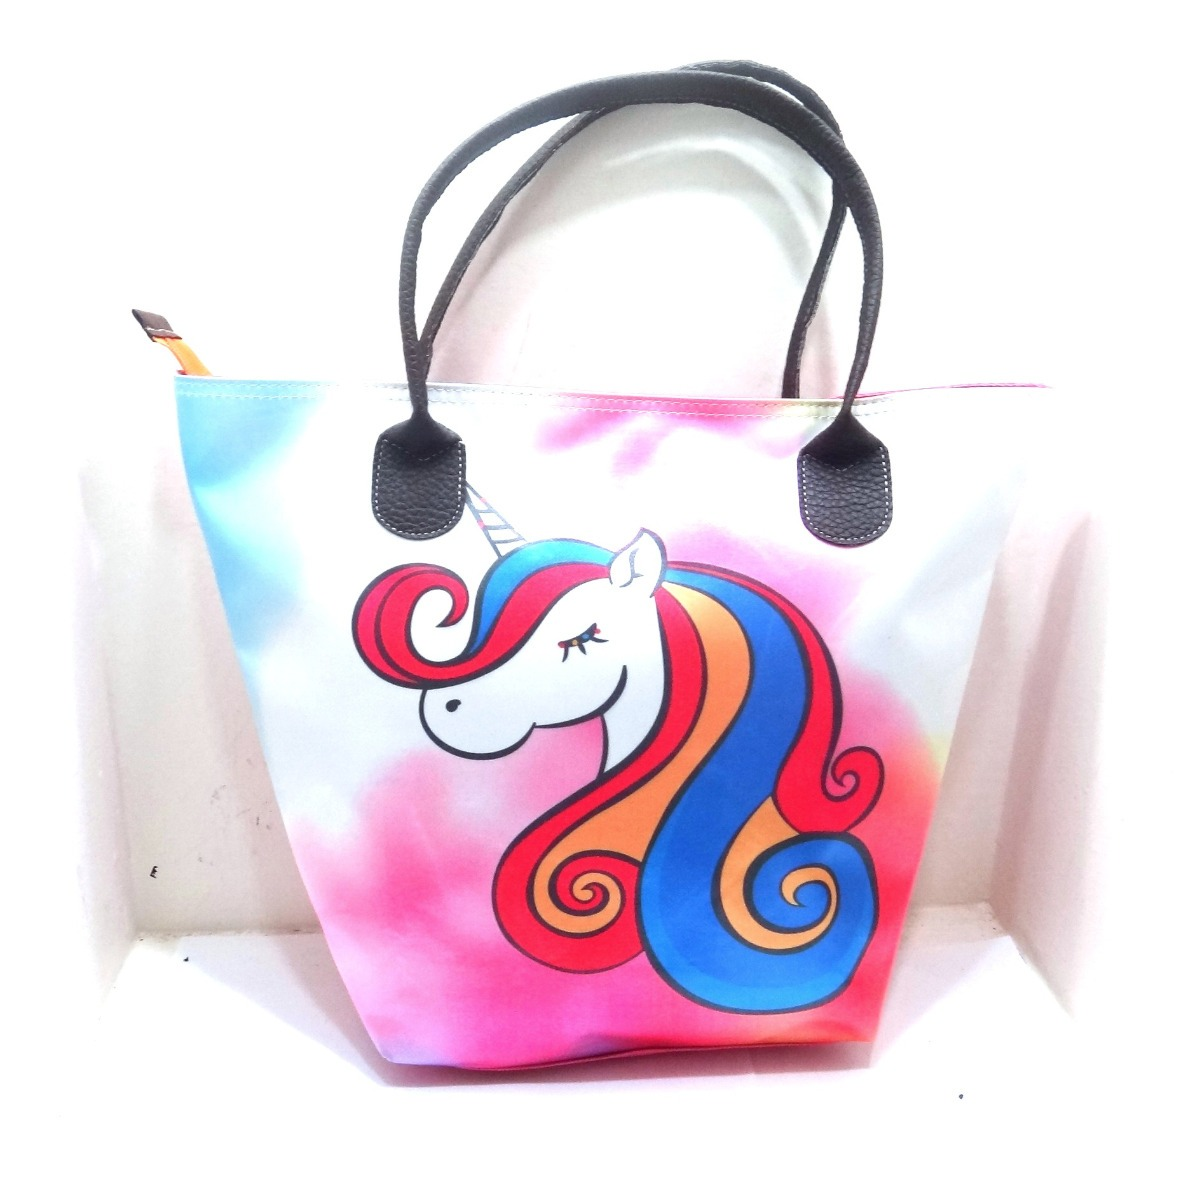 8069591df cartera bolso bandolero mayor detal unicornio mujer moda mcs. Cargando zoom.